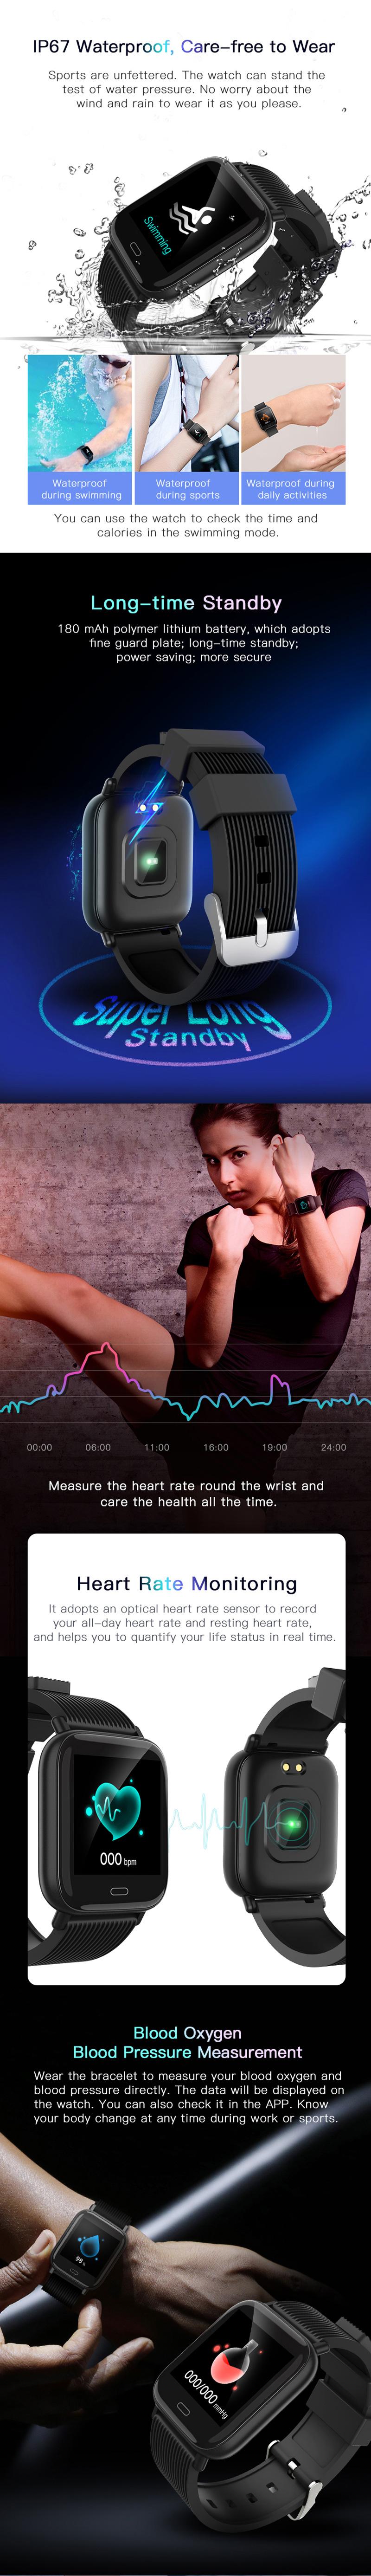 Bakeey G20 Dynamic UI Weather Target Setting HR Blood Pressure Oxygen Monitor bluetooth5.0 Smart Watch 18